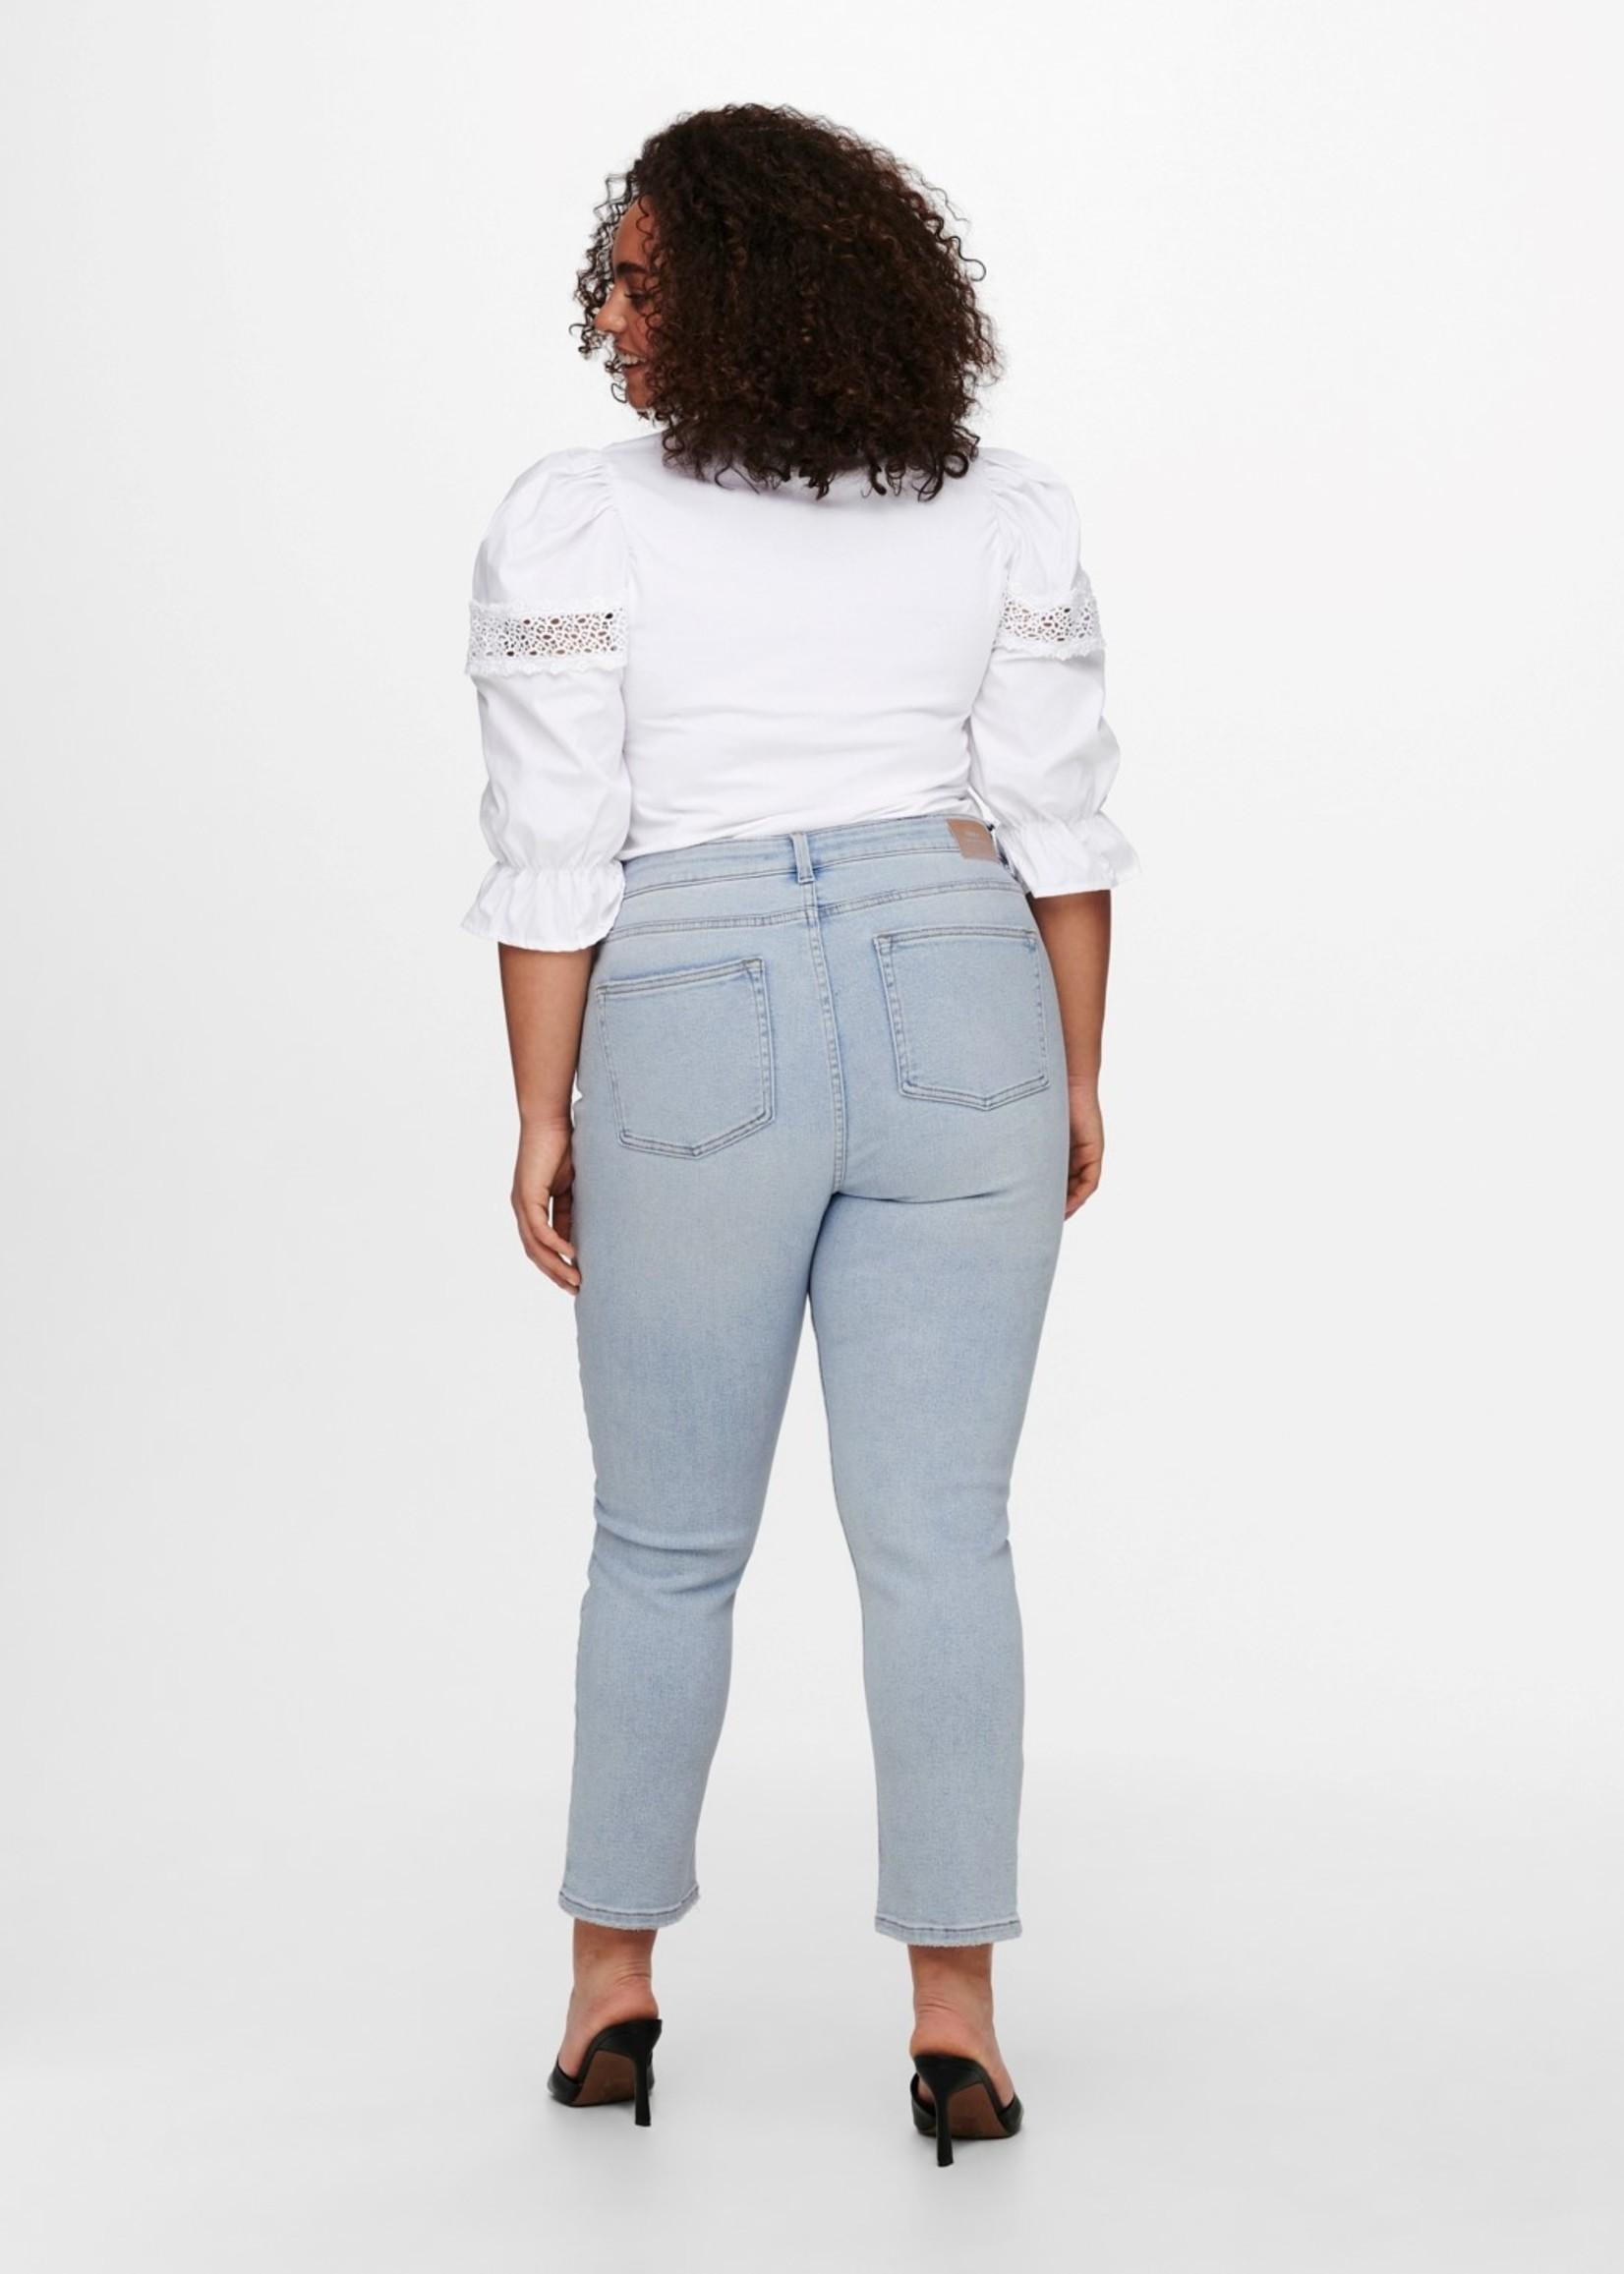 Only Carmakoma Only Carmakoma Rica Ankle Jeans